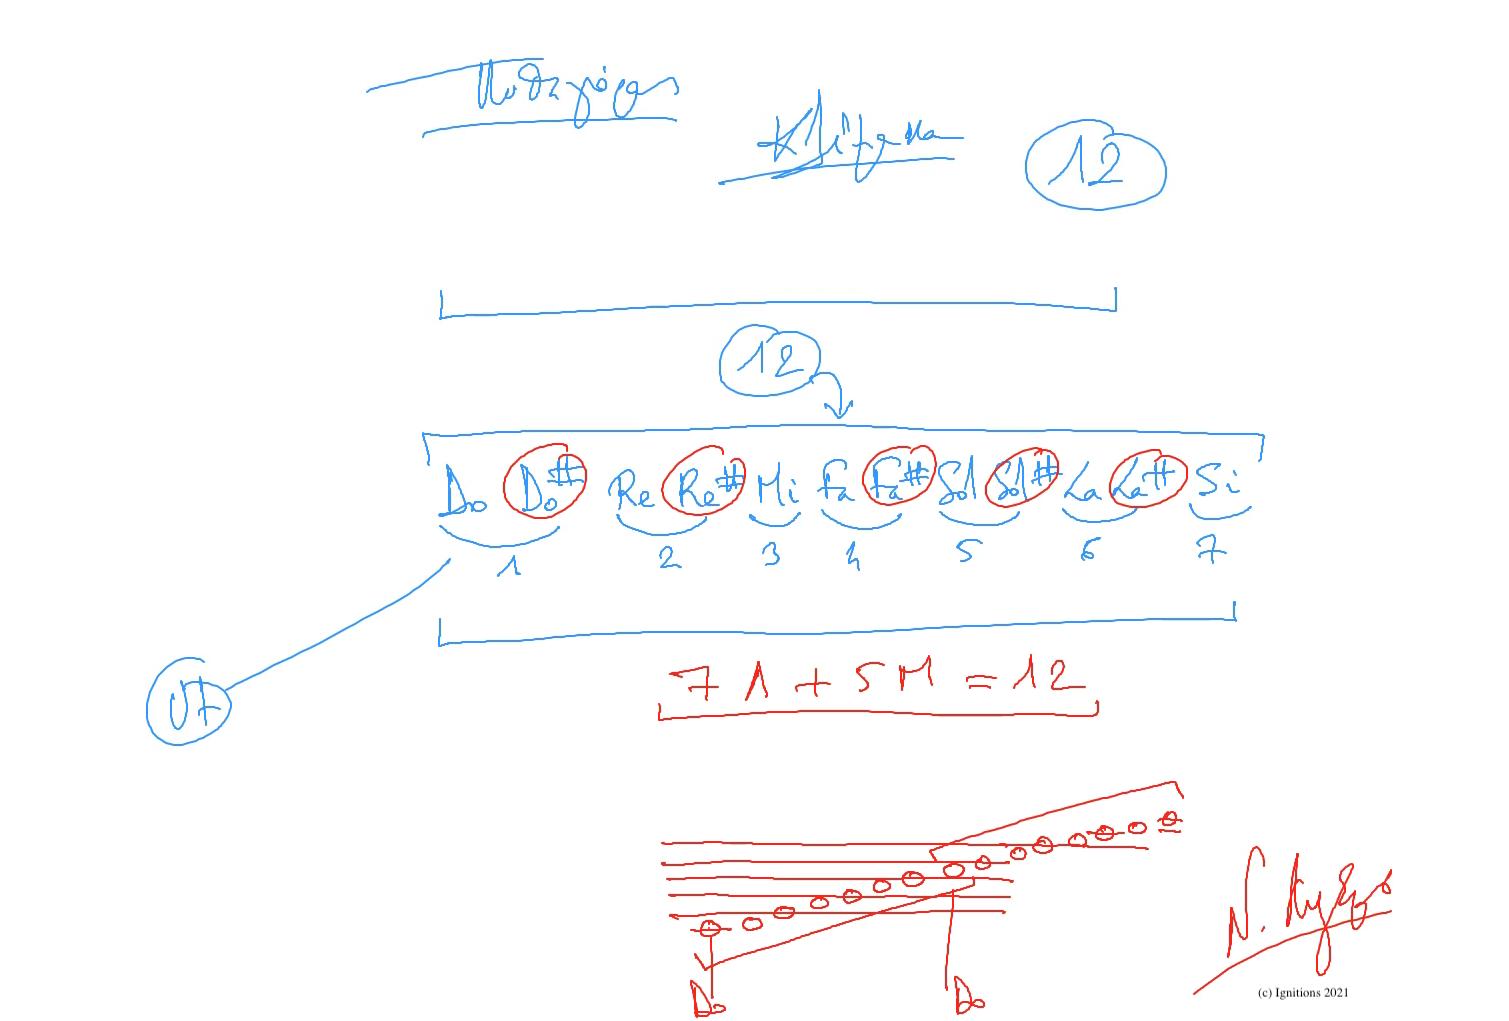 59032 - e-Μάθημα: Θεωρία μουσικής και μεταλλόφωνο. (Dessin)